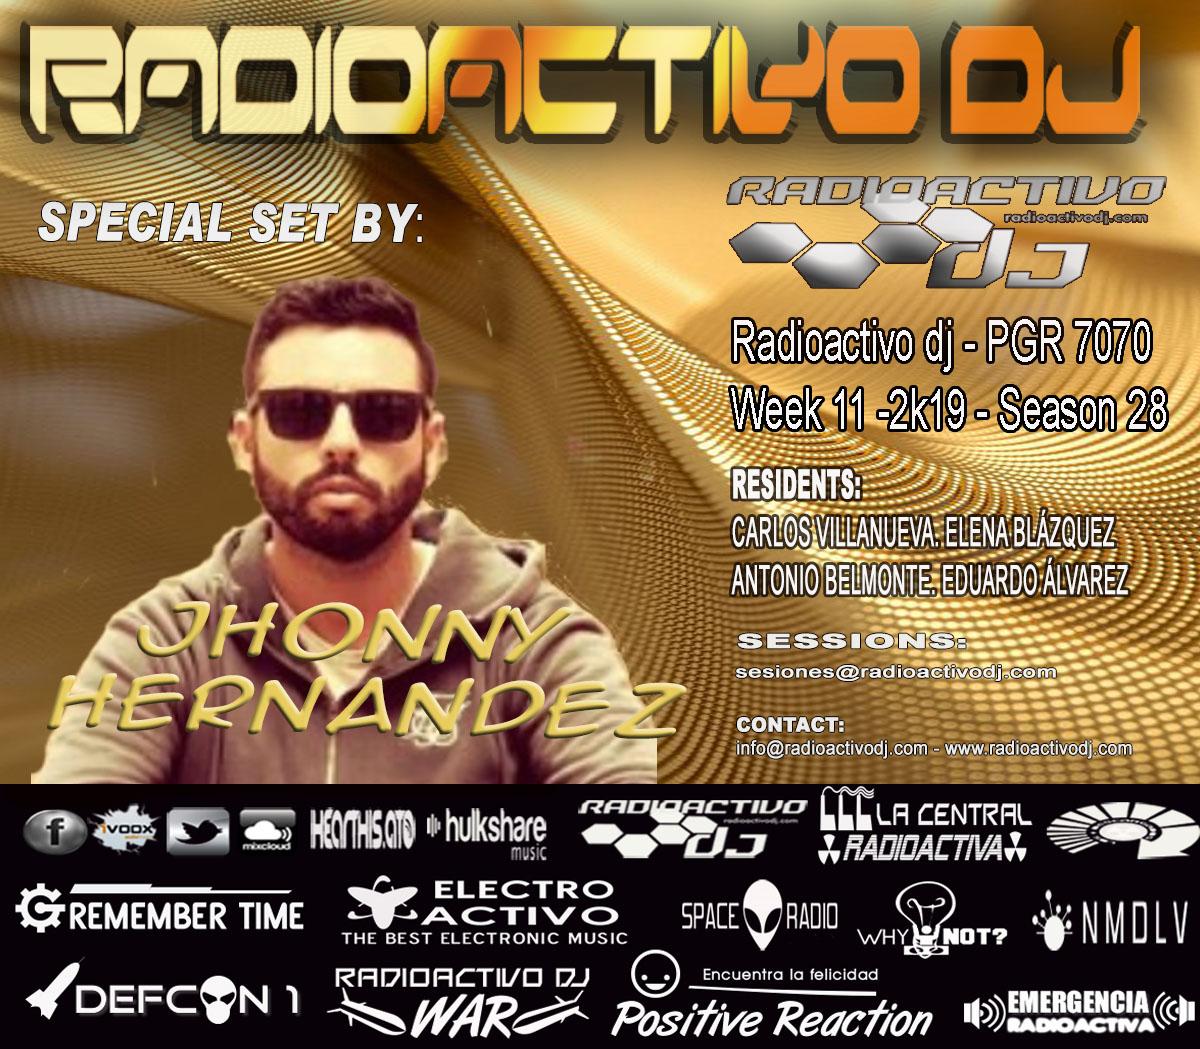 RADIOACTIVO-DJ-11-2019